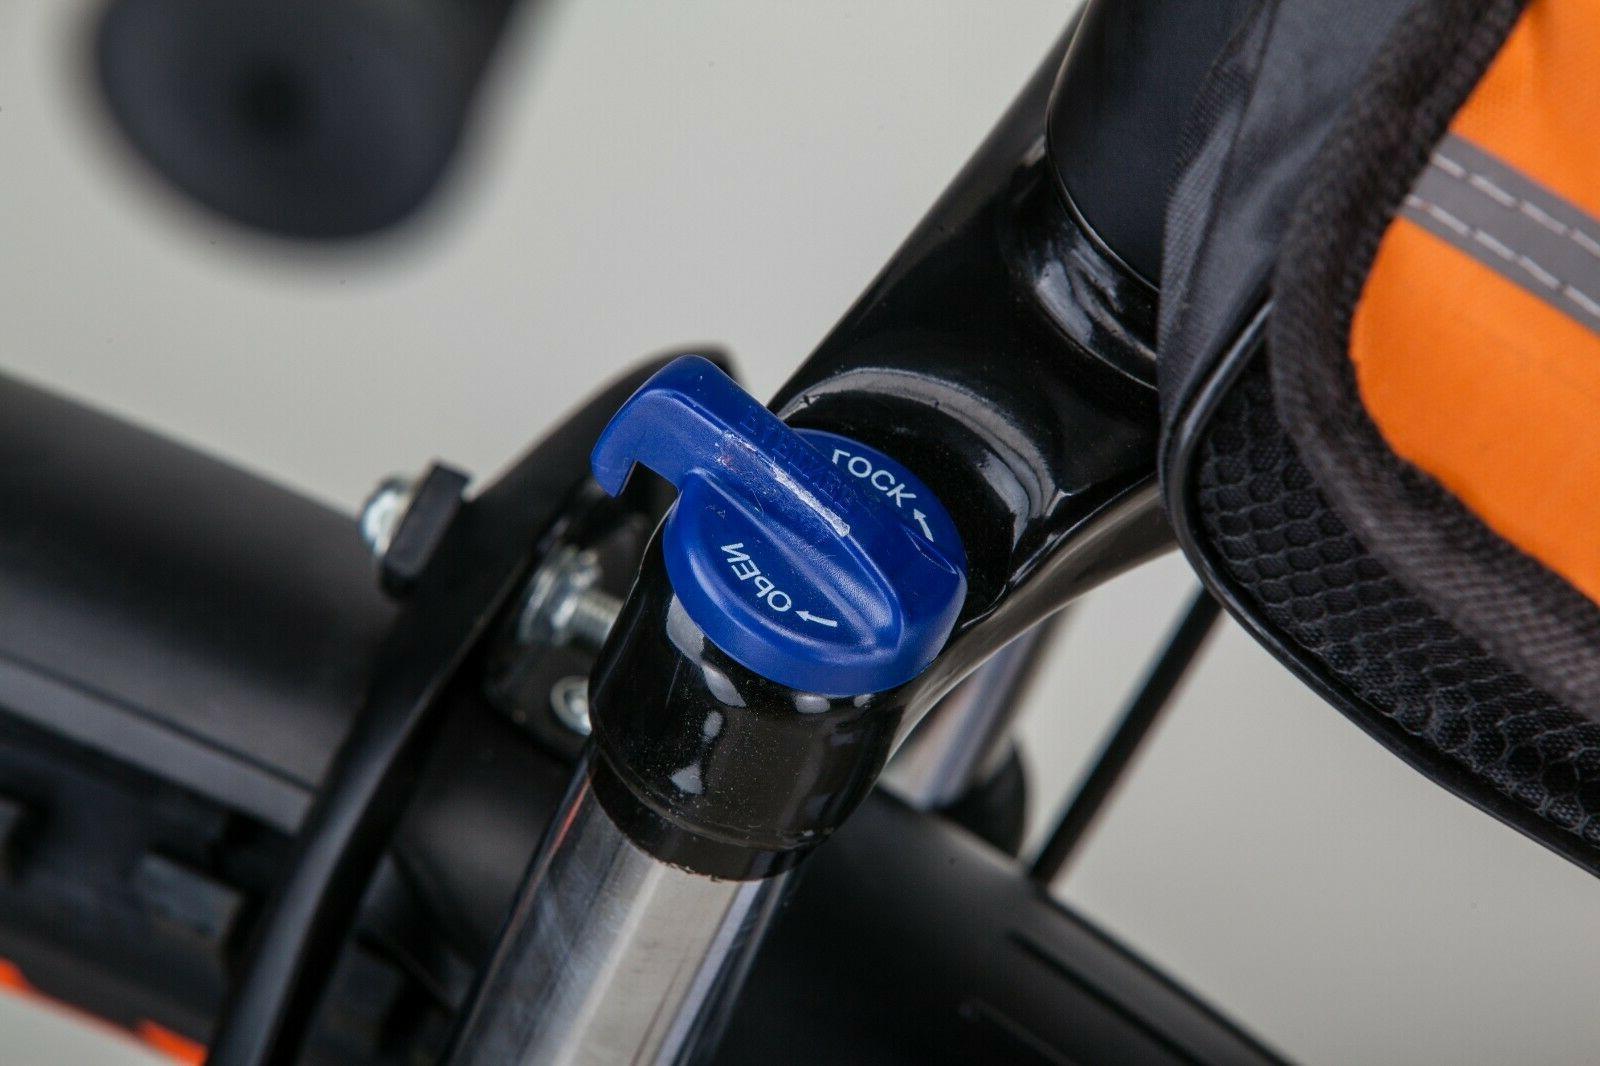 Mountain Bike Shimano 21-Speed Bag,Lock,Tool.